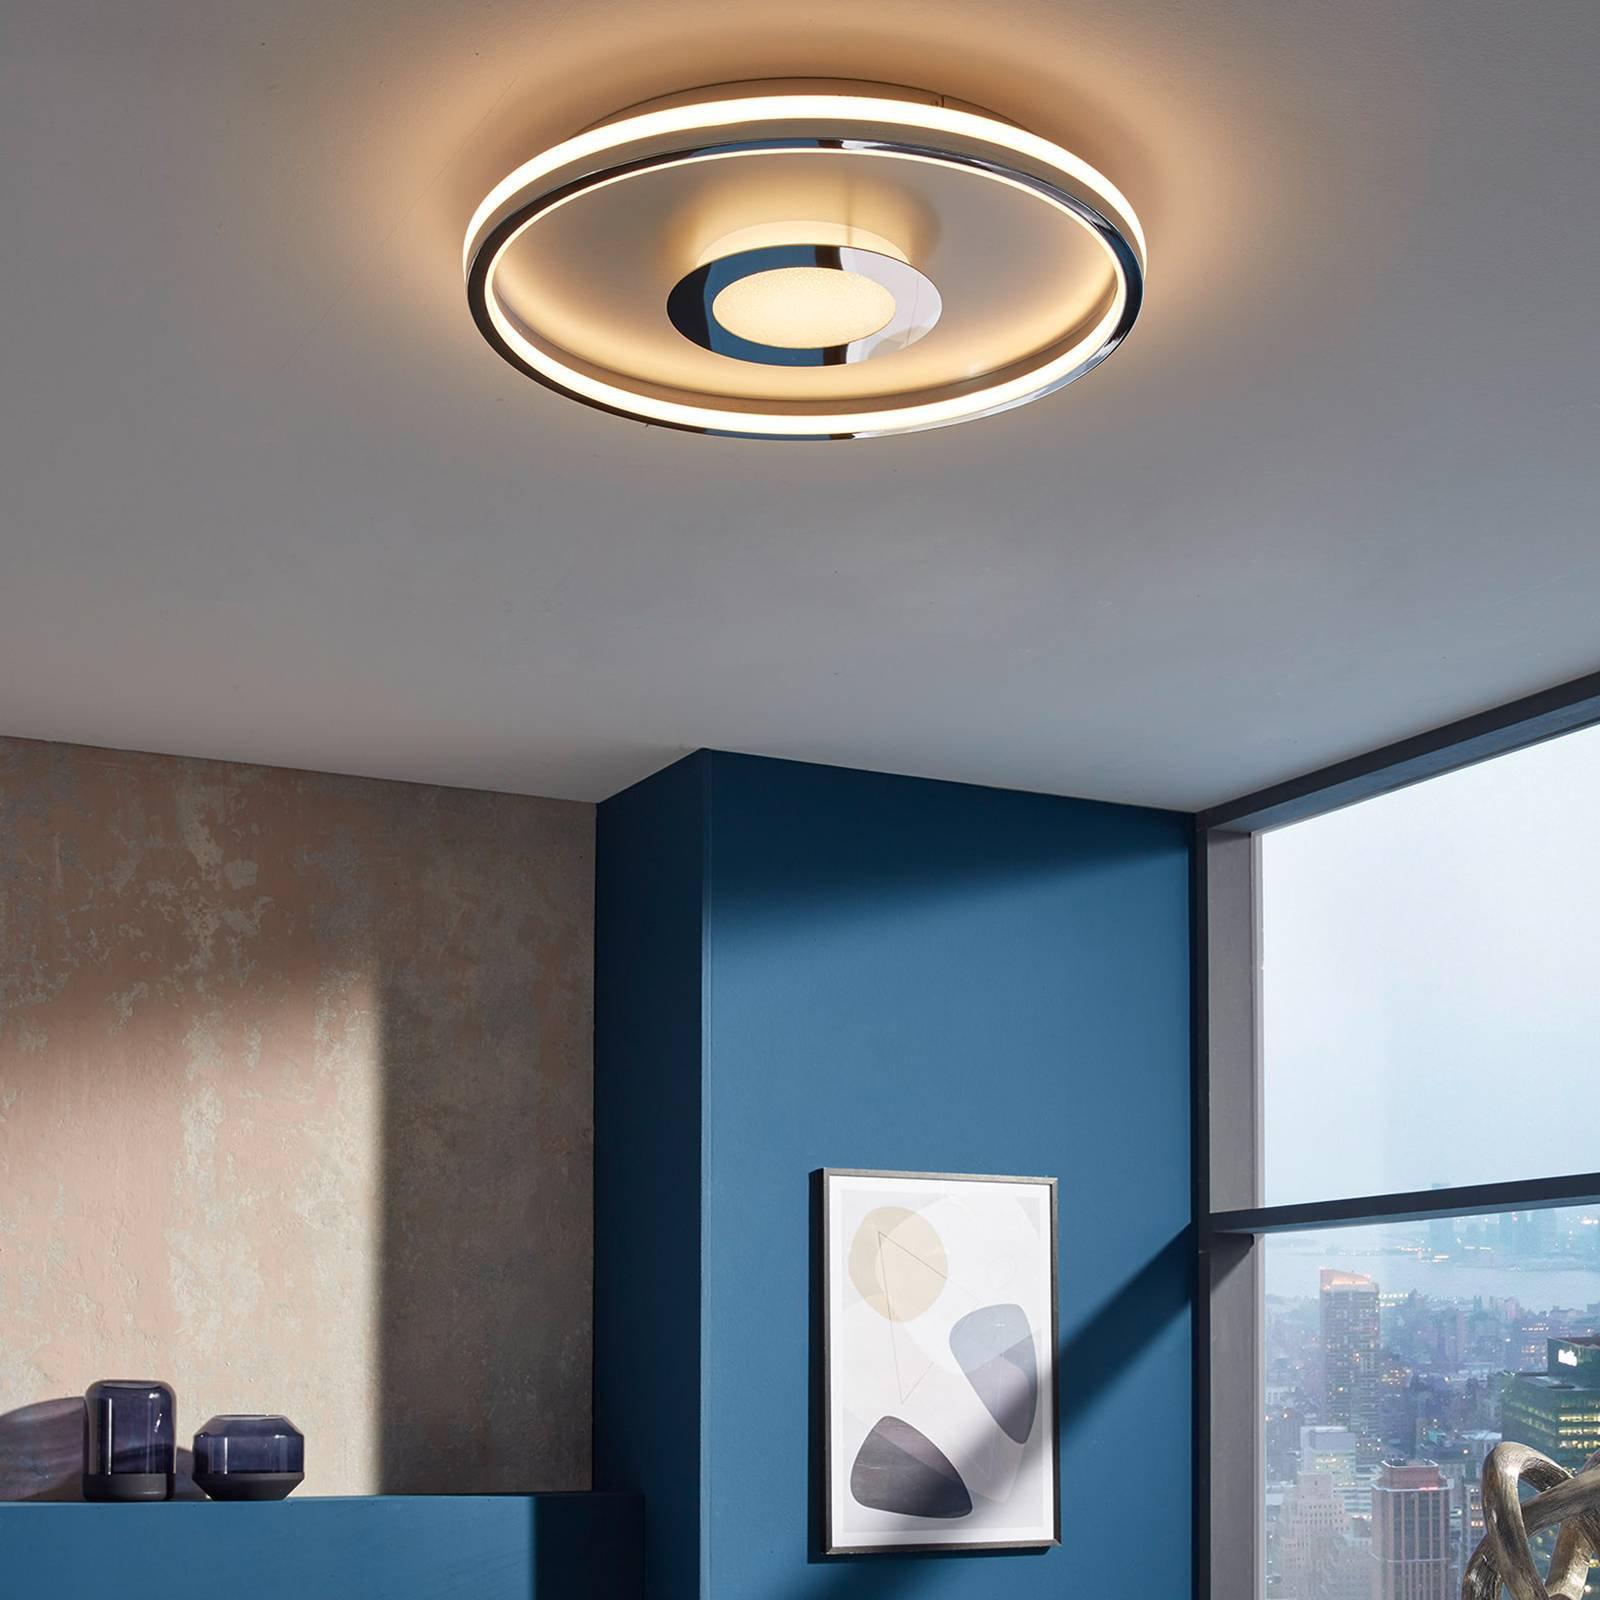 LED-taklampe Bug rund, krom, 60 cm